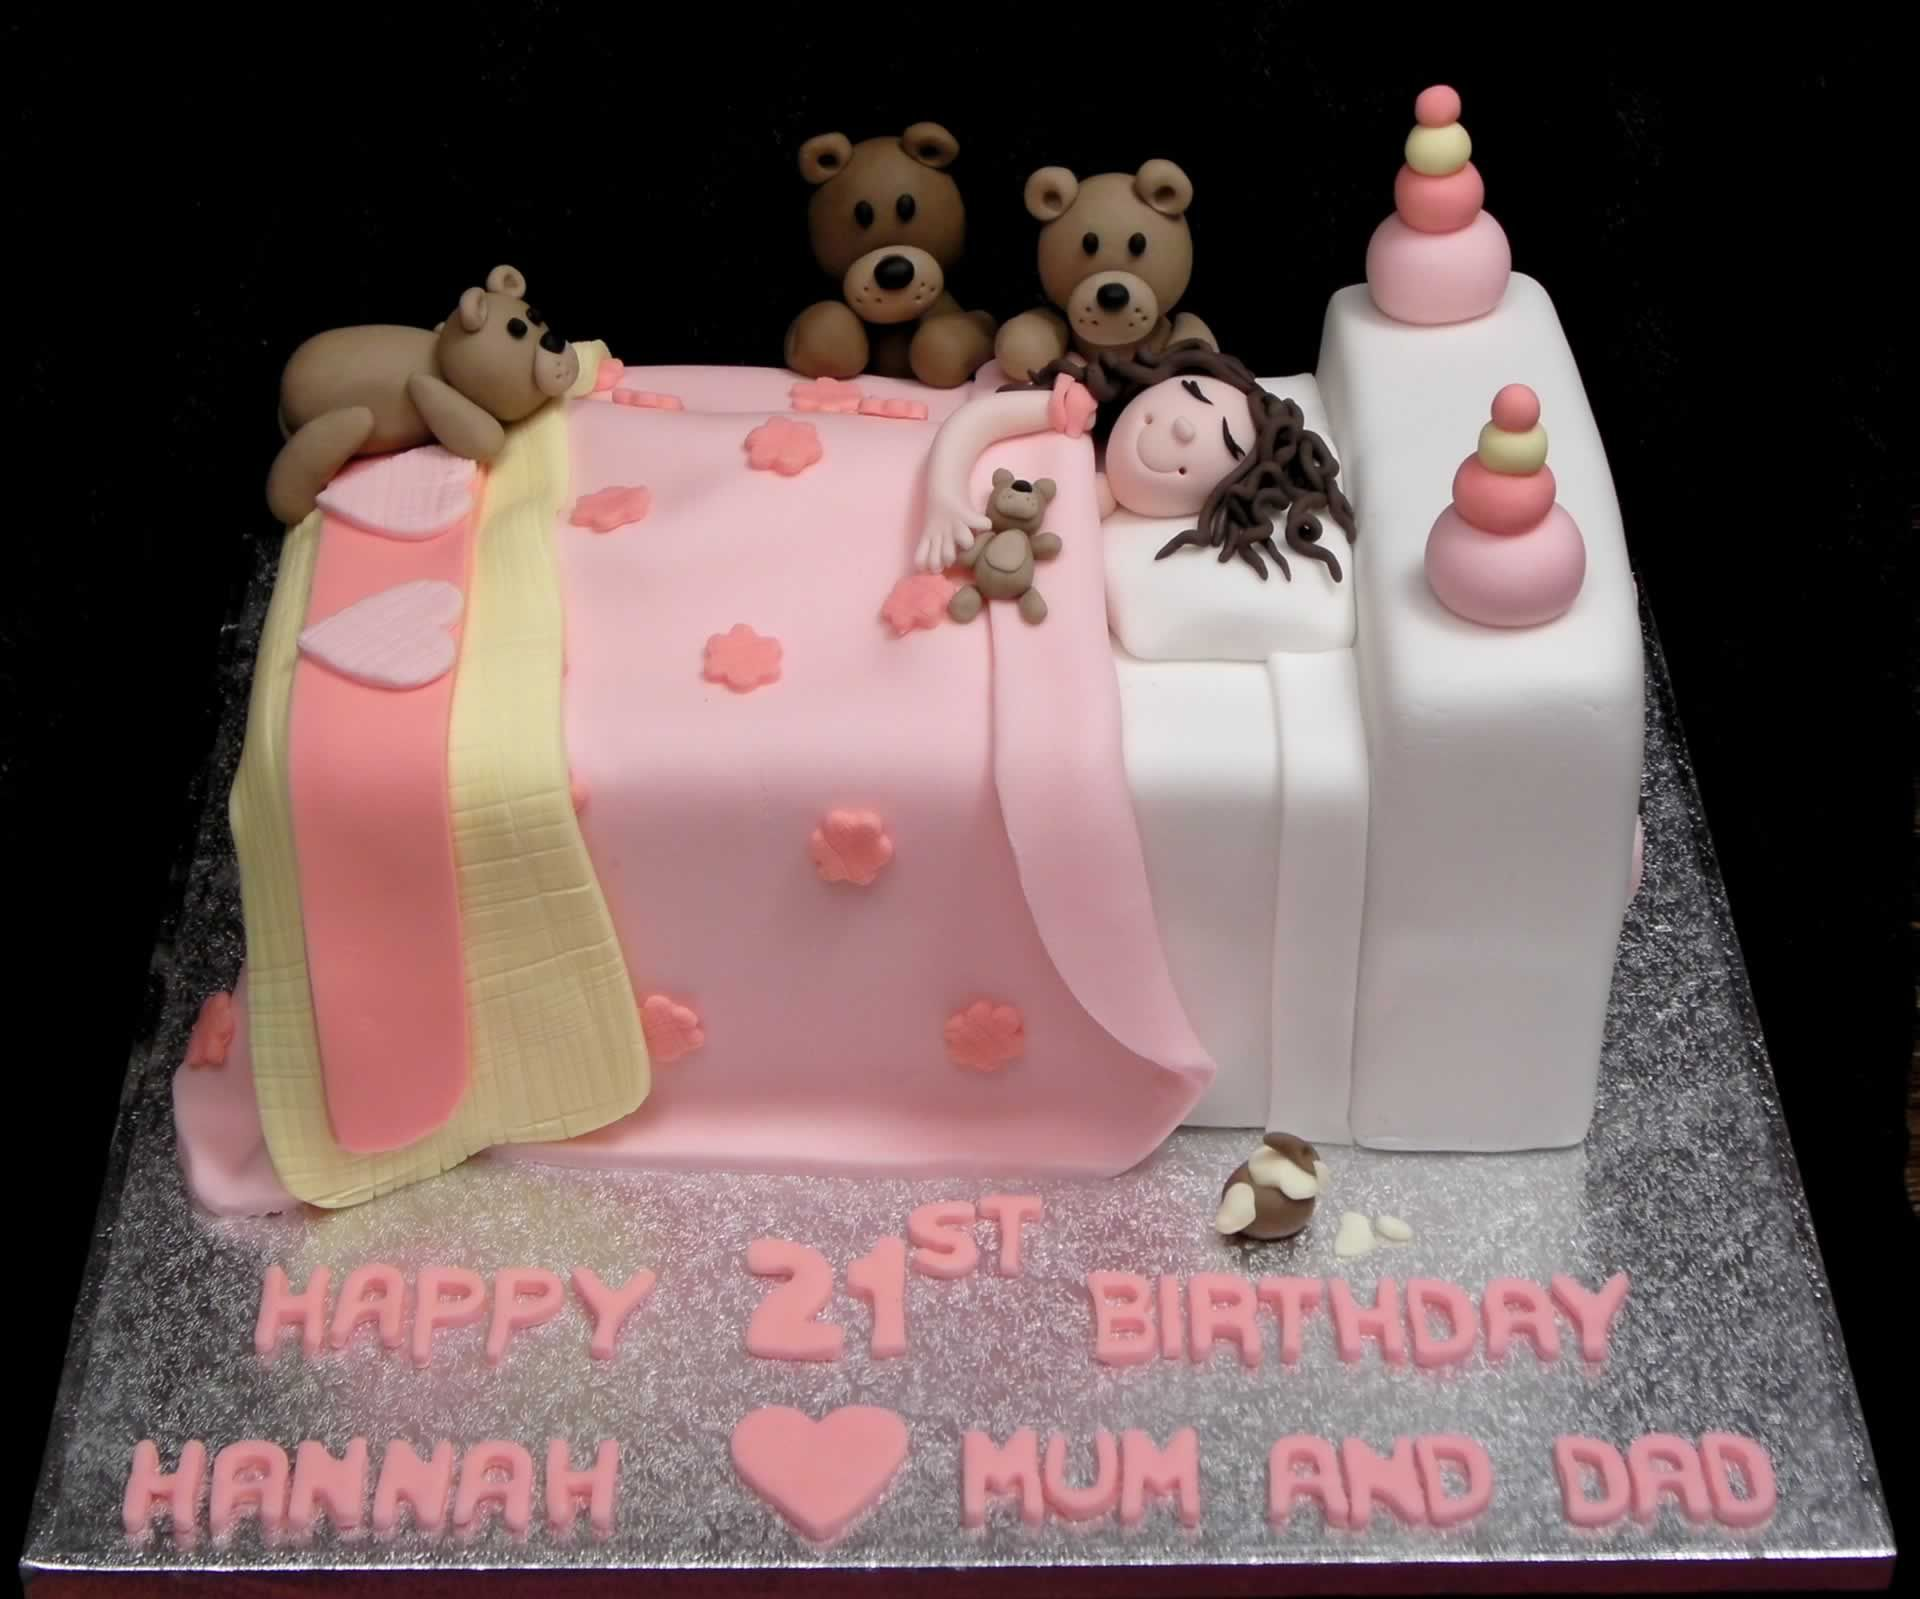 Goldilocks And The Three Bears Cake Brownilocks